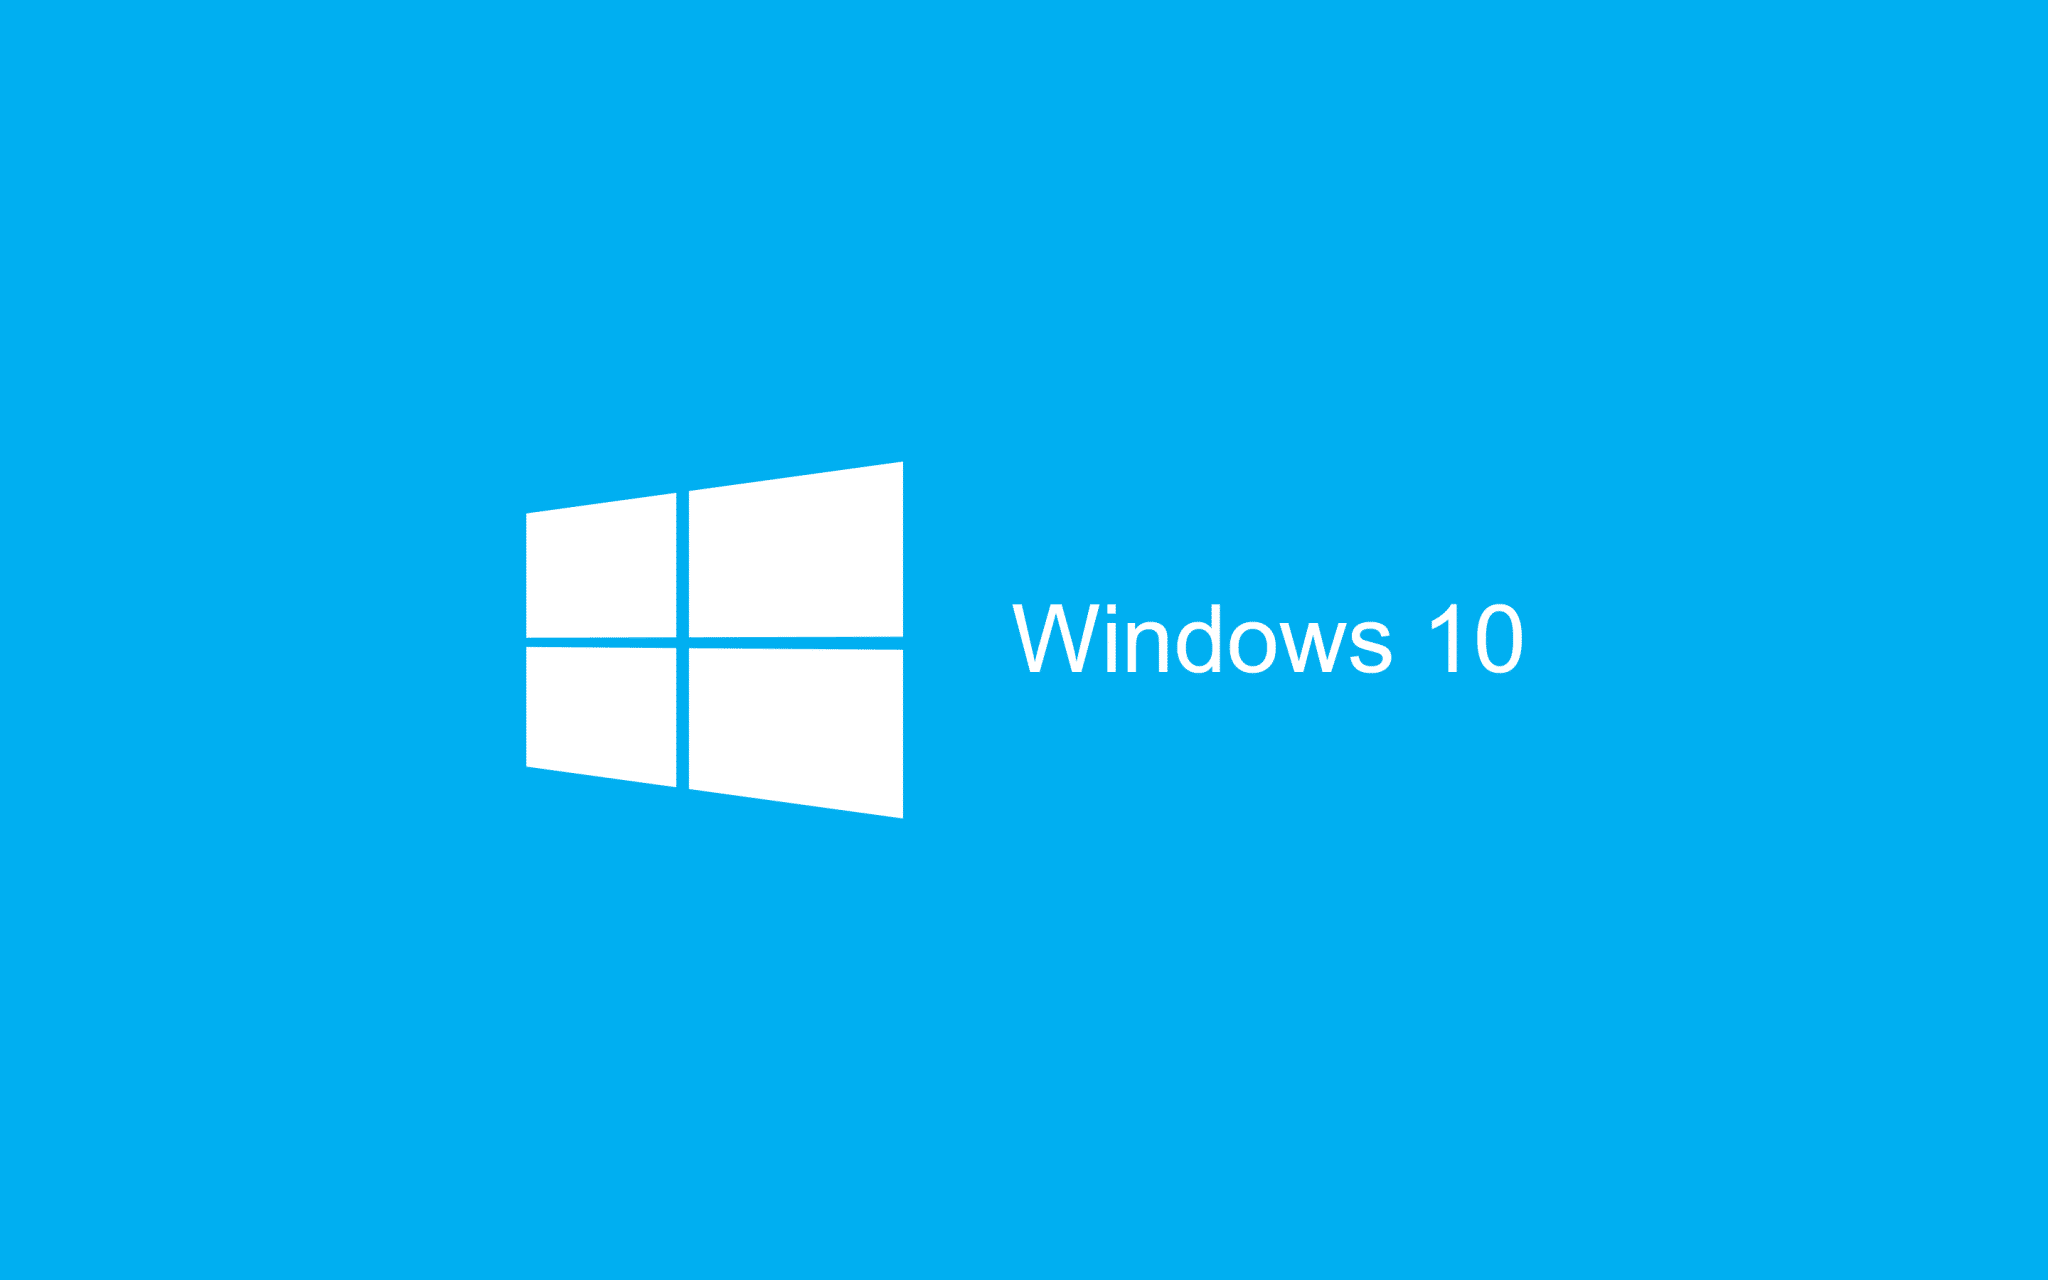 Blue Wallpaper Windows 10 HD 2880x1800